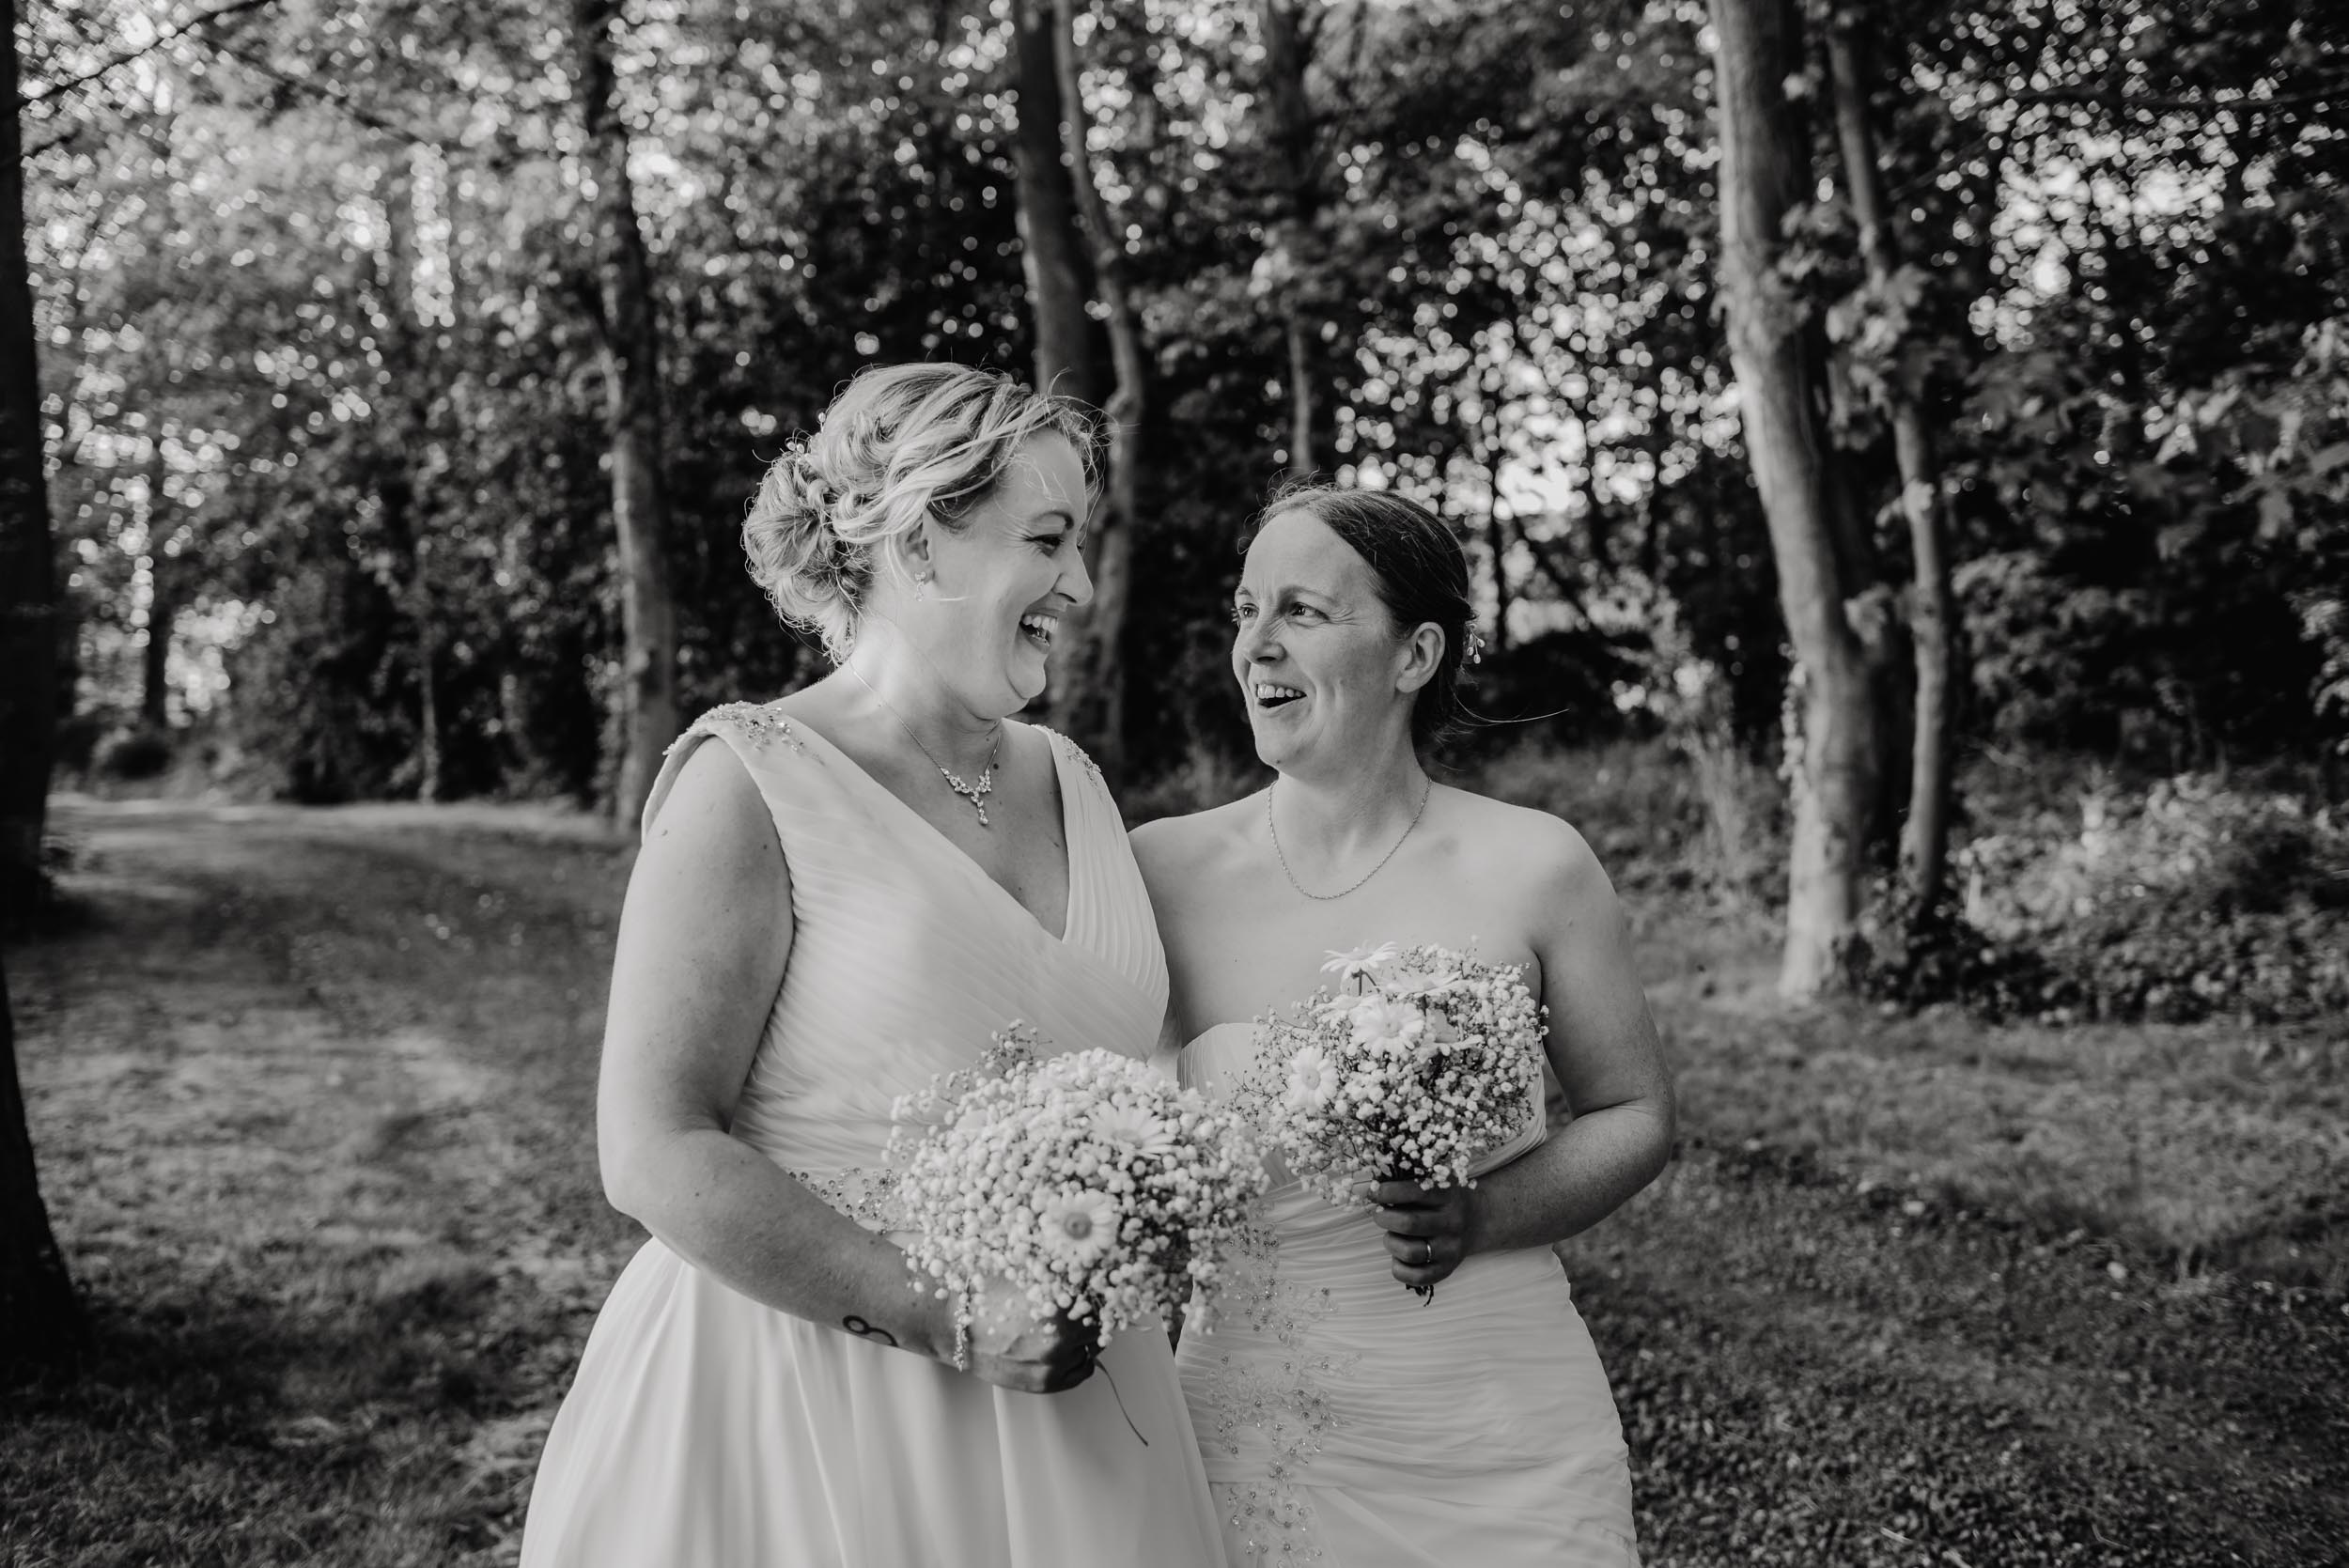 Donington-park-farm-wedding-photography-589.jpg